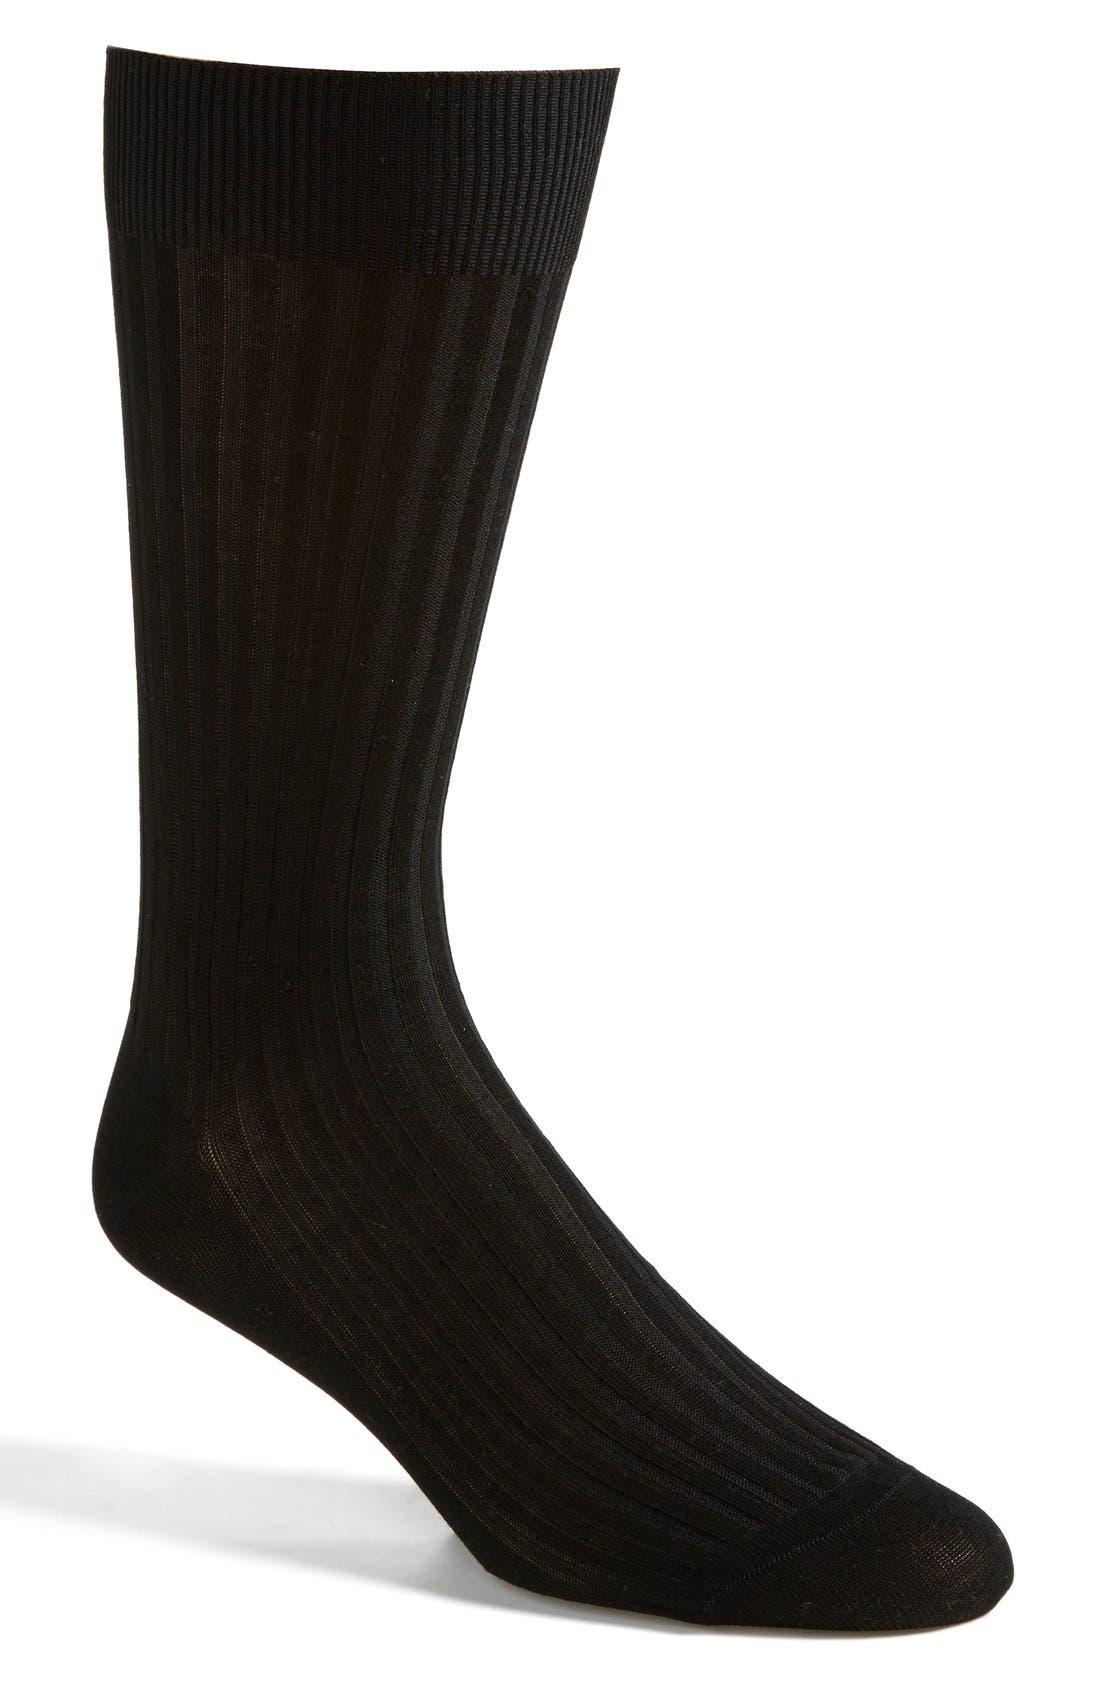 Main Image - Pantherella Cotton Blend Mid Calf Dress Socks